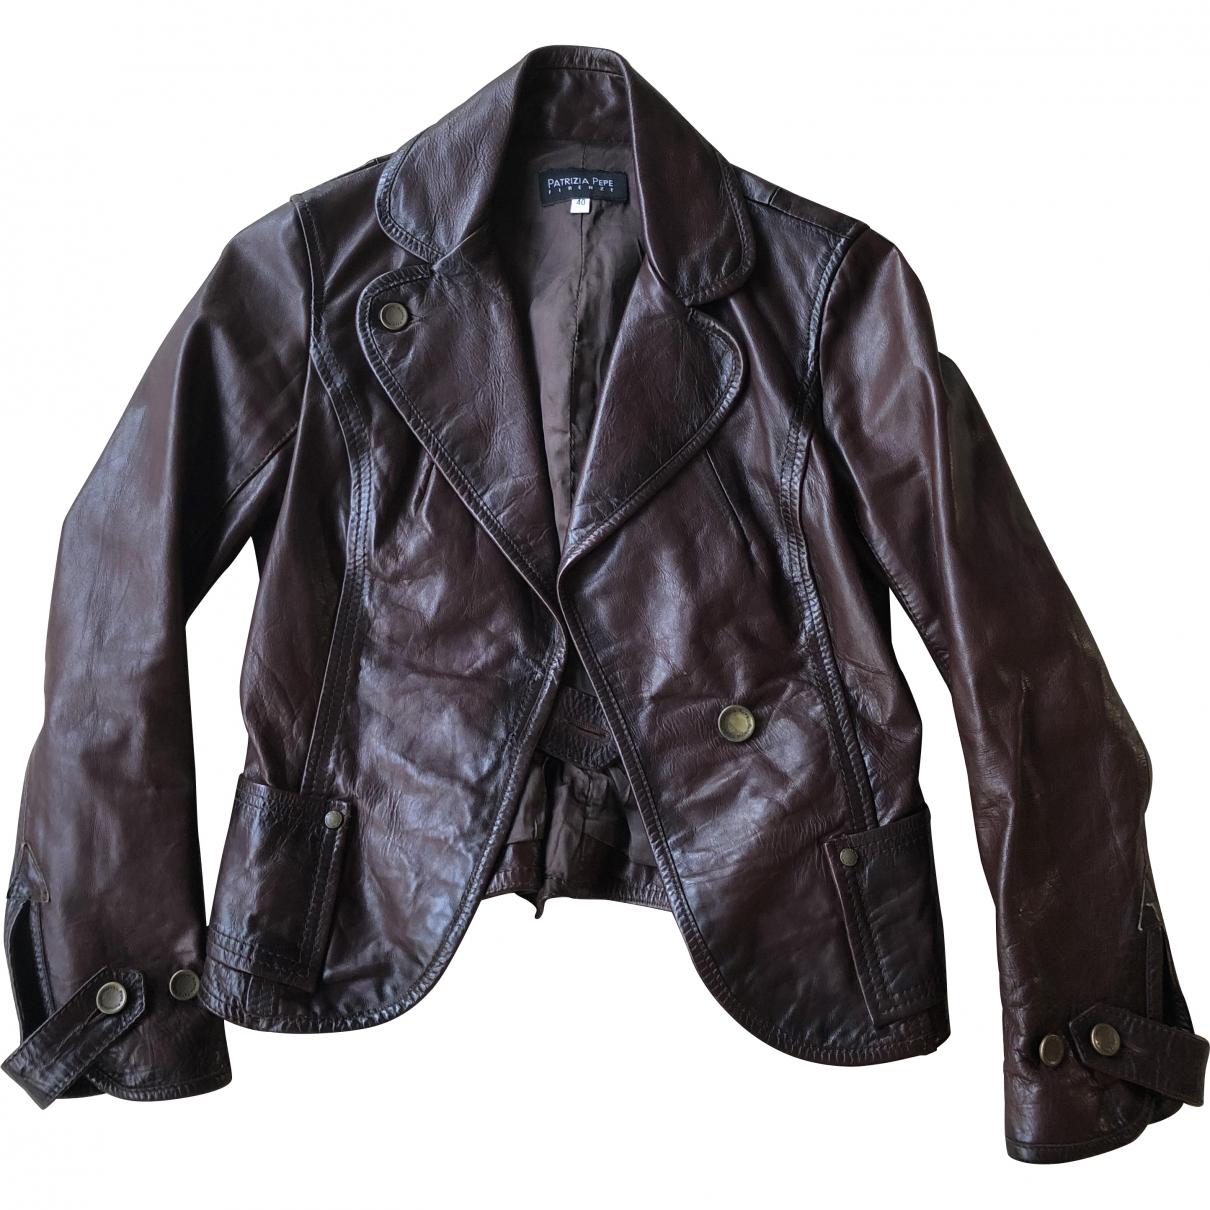 Patrizia Pepe \N Burgundy Leather jacket for Women 36 FR